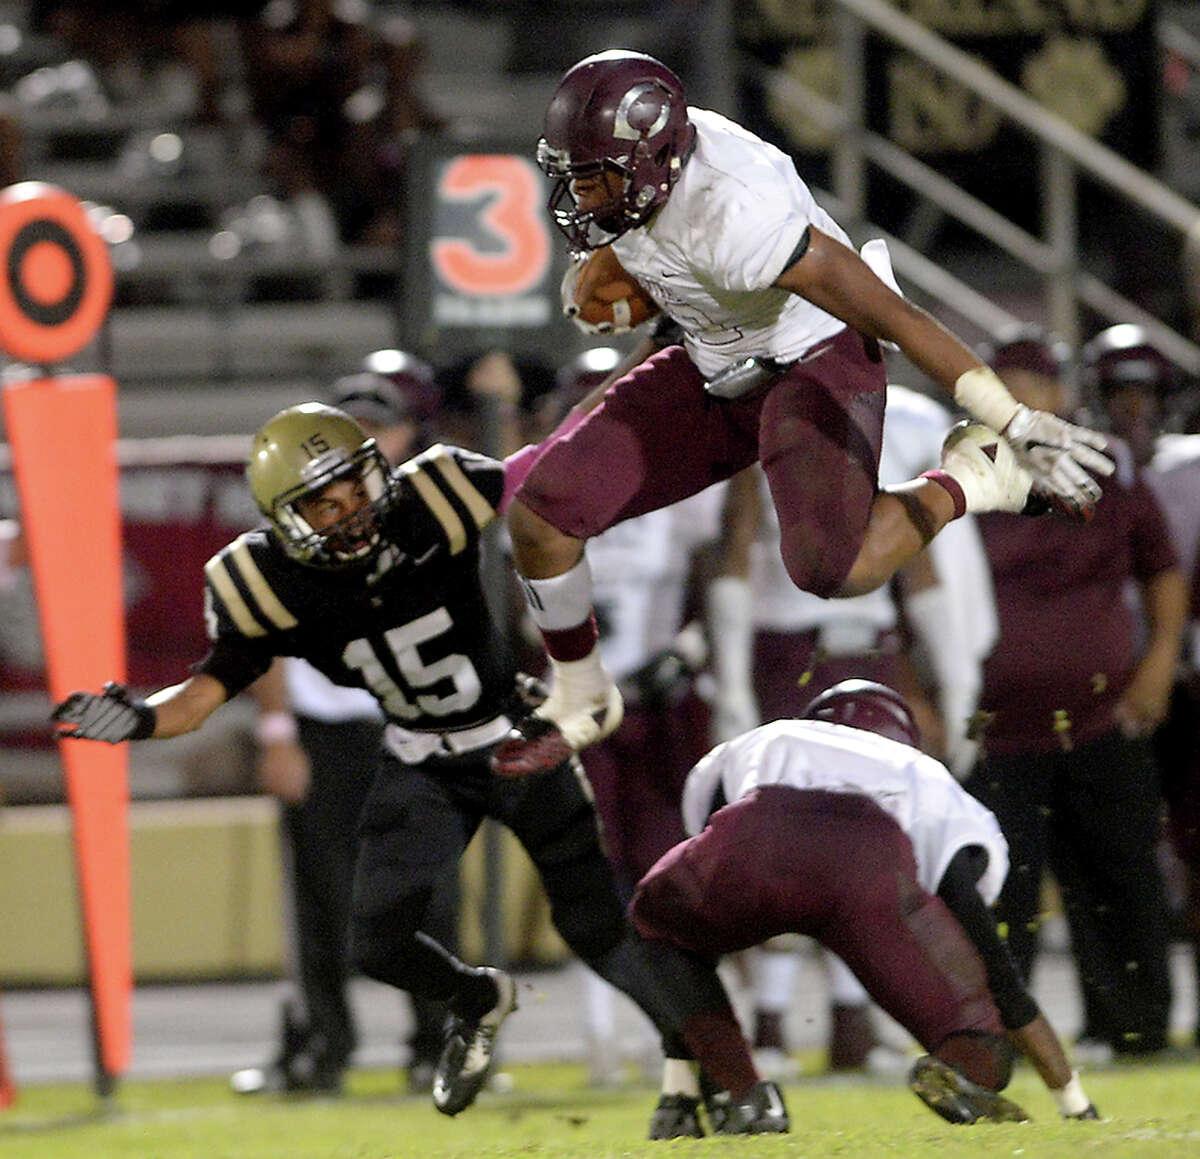 Devwah Whaley, Central Running Back Height: 6-1 Weight: 210 College: Arkansas